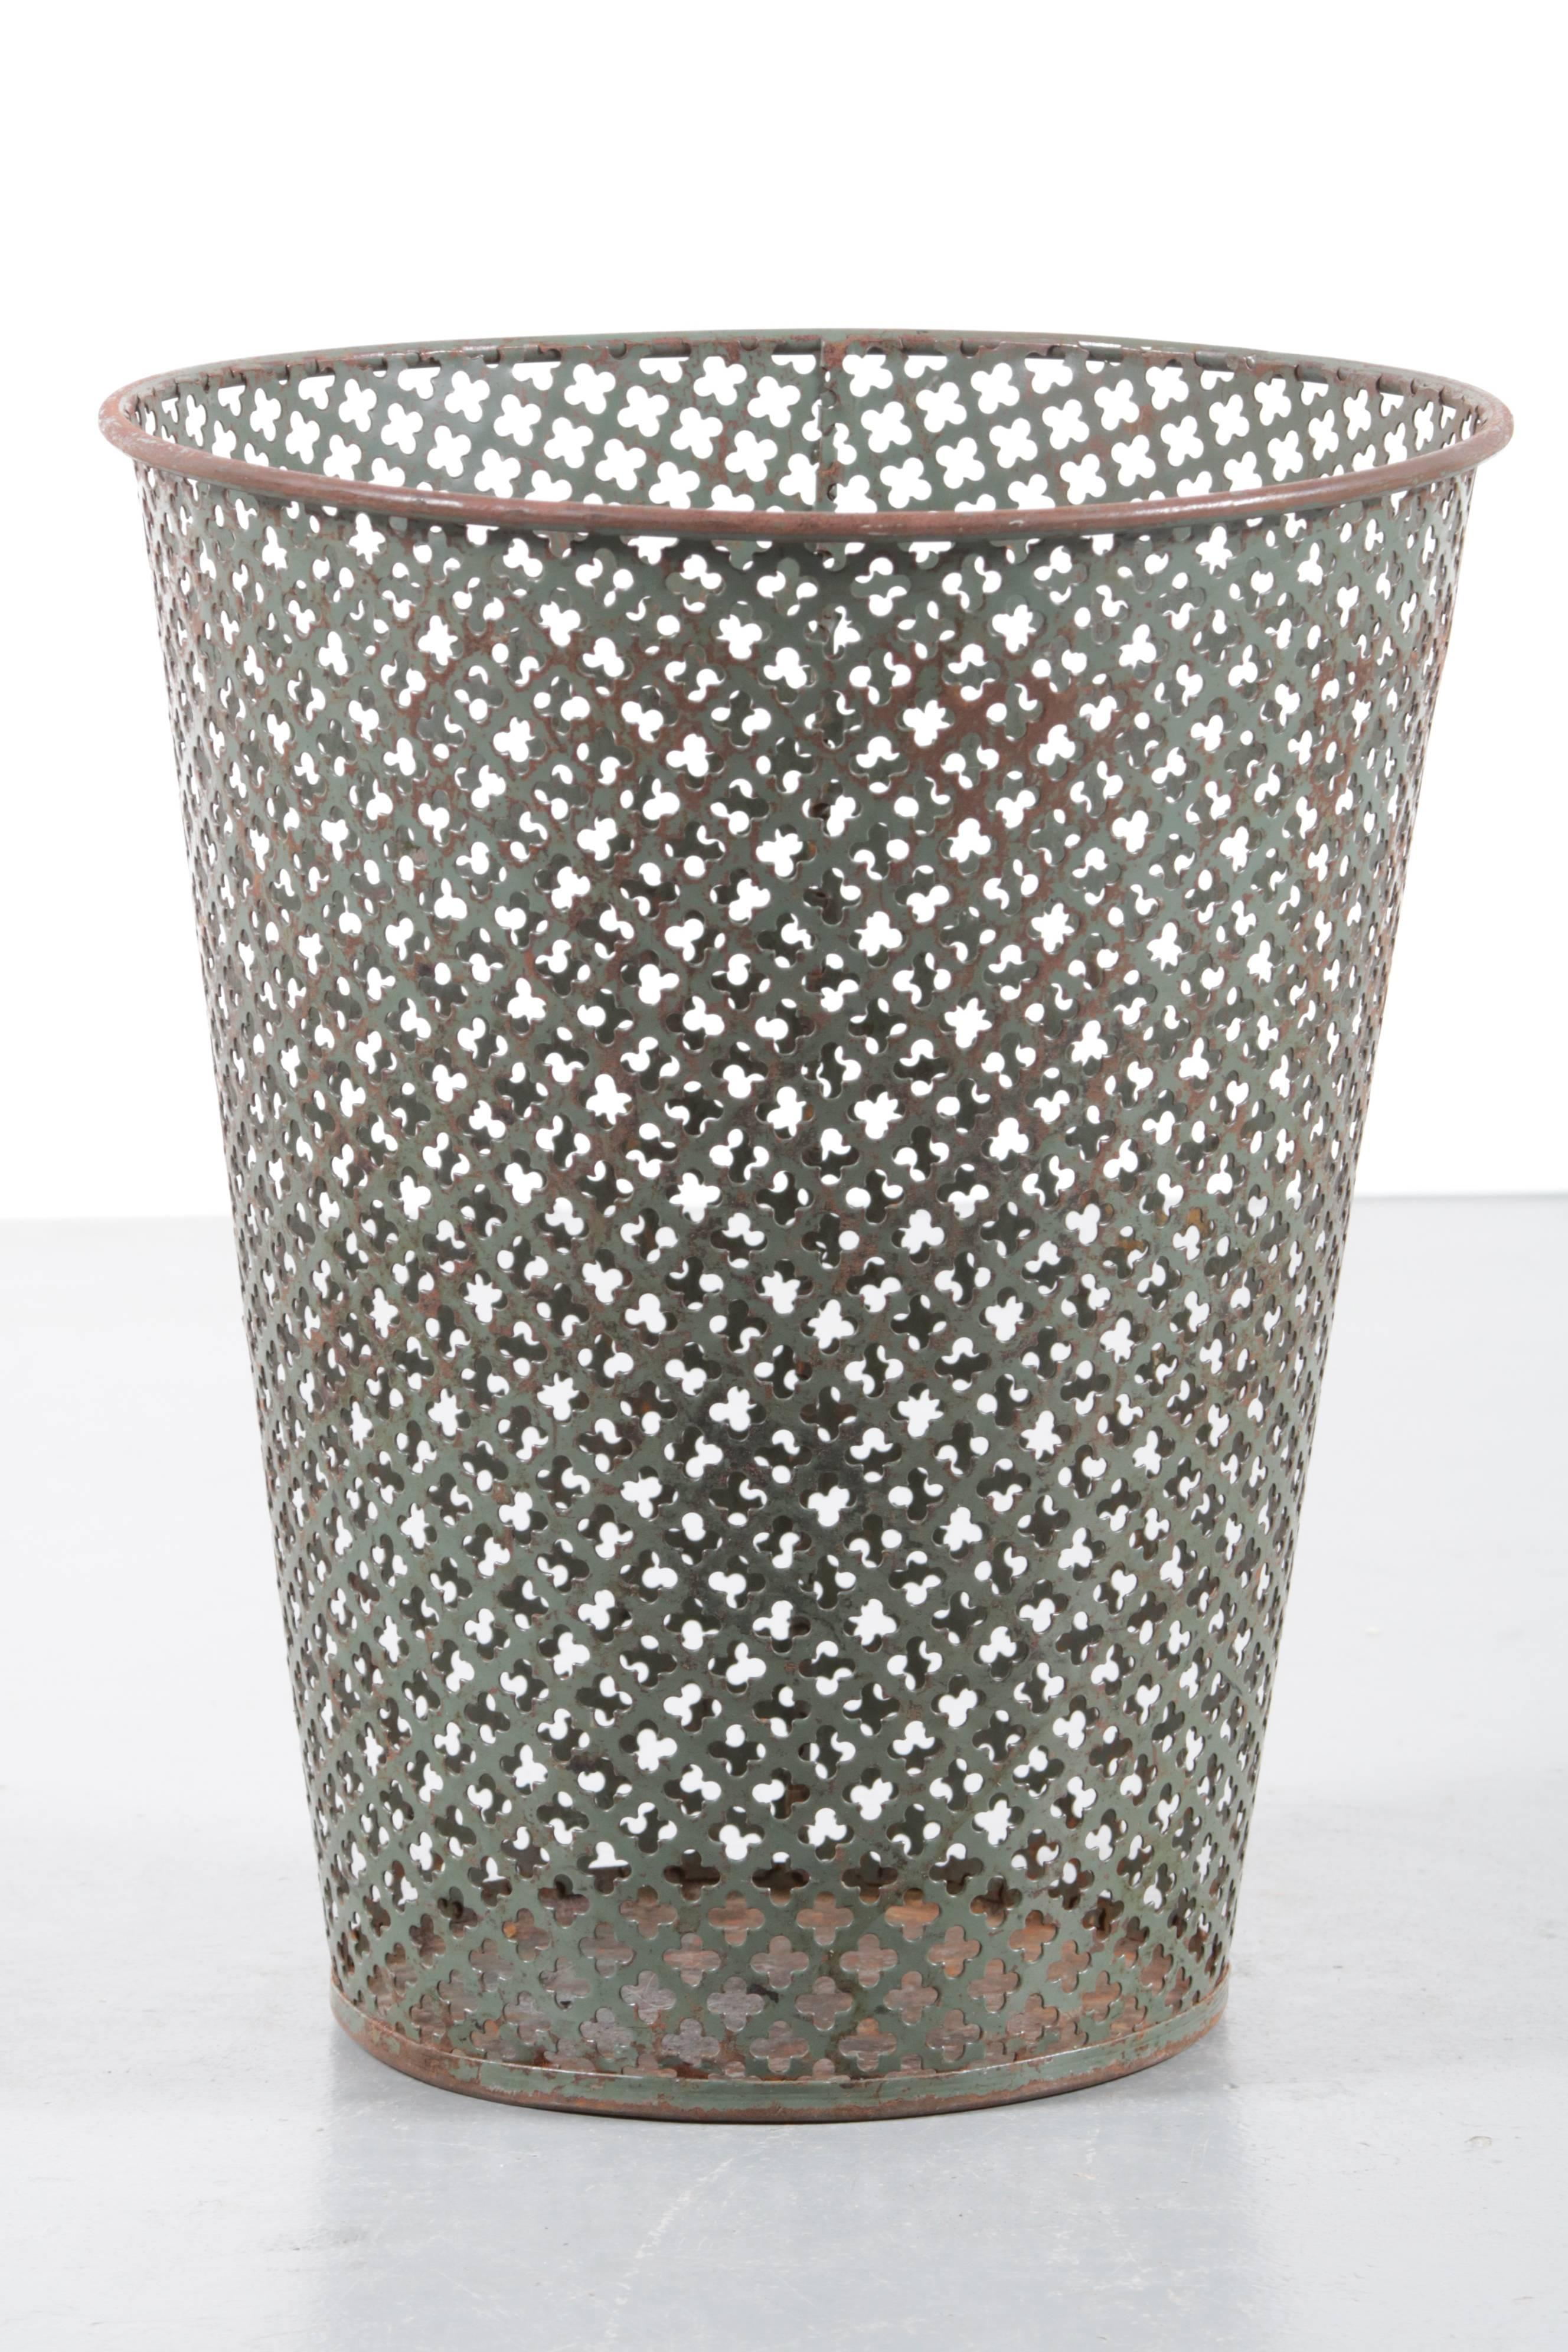 Trash Bin By Mathieu Matgot Manufactured By Ateliers